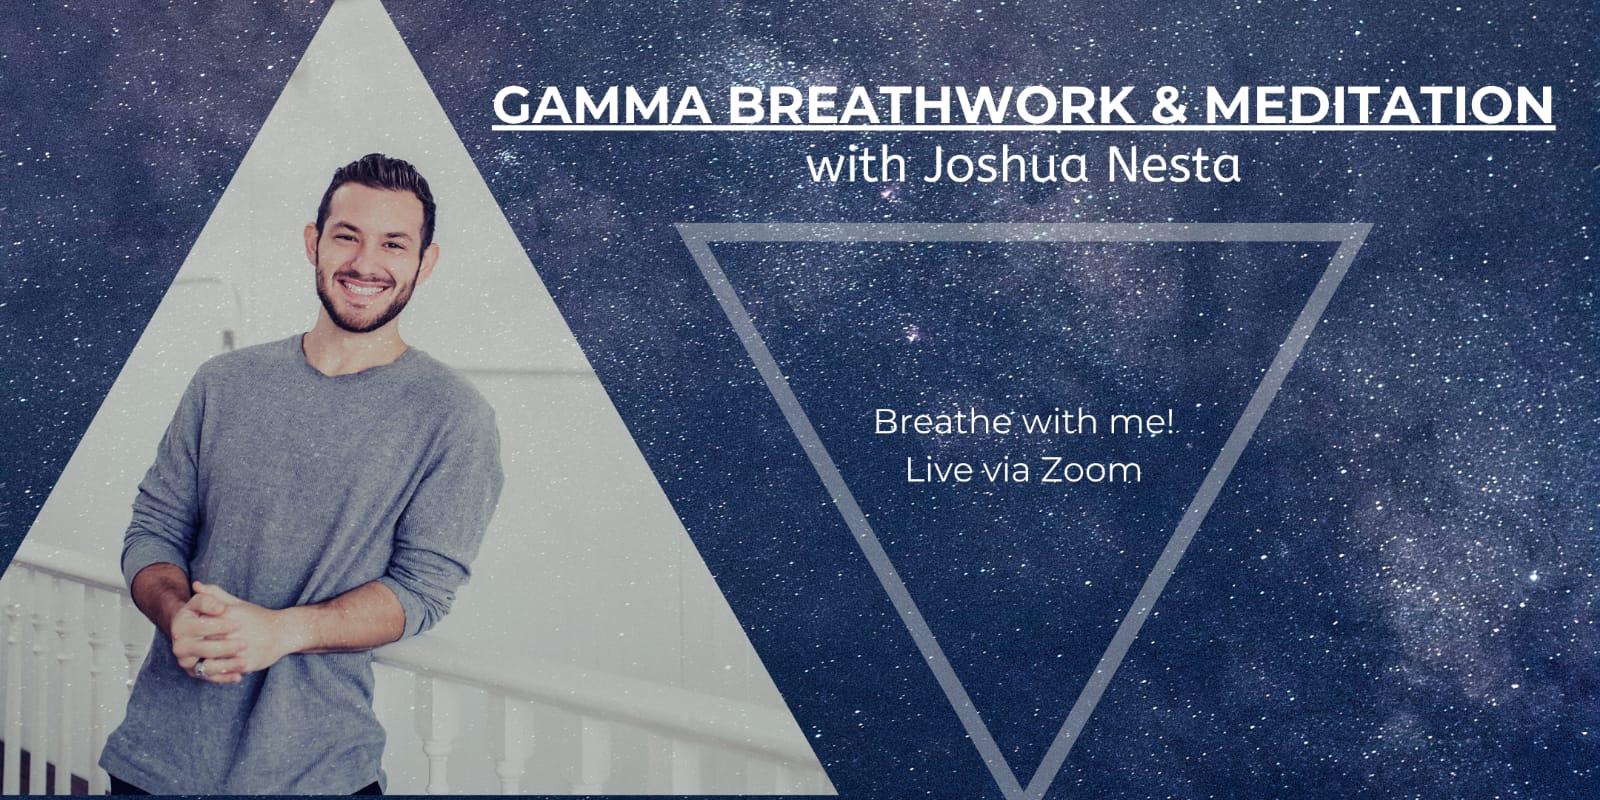 Gamma Breathwork Experience